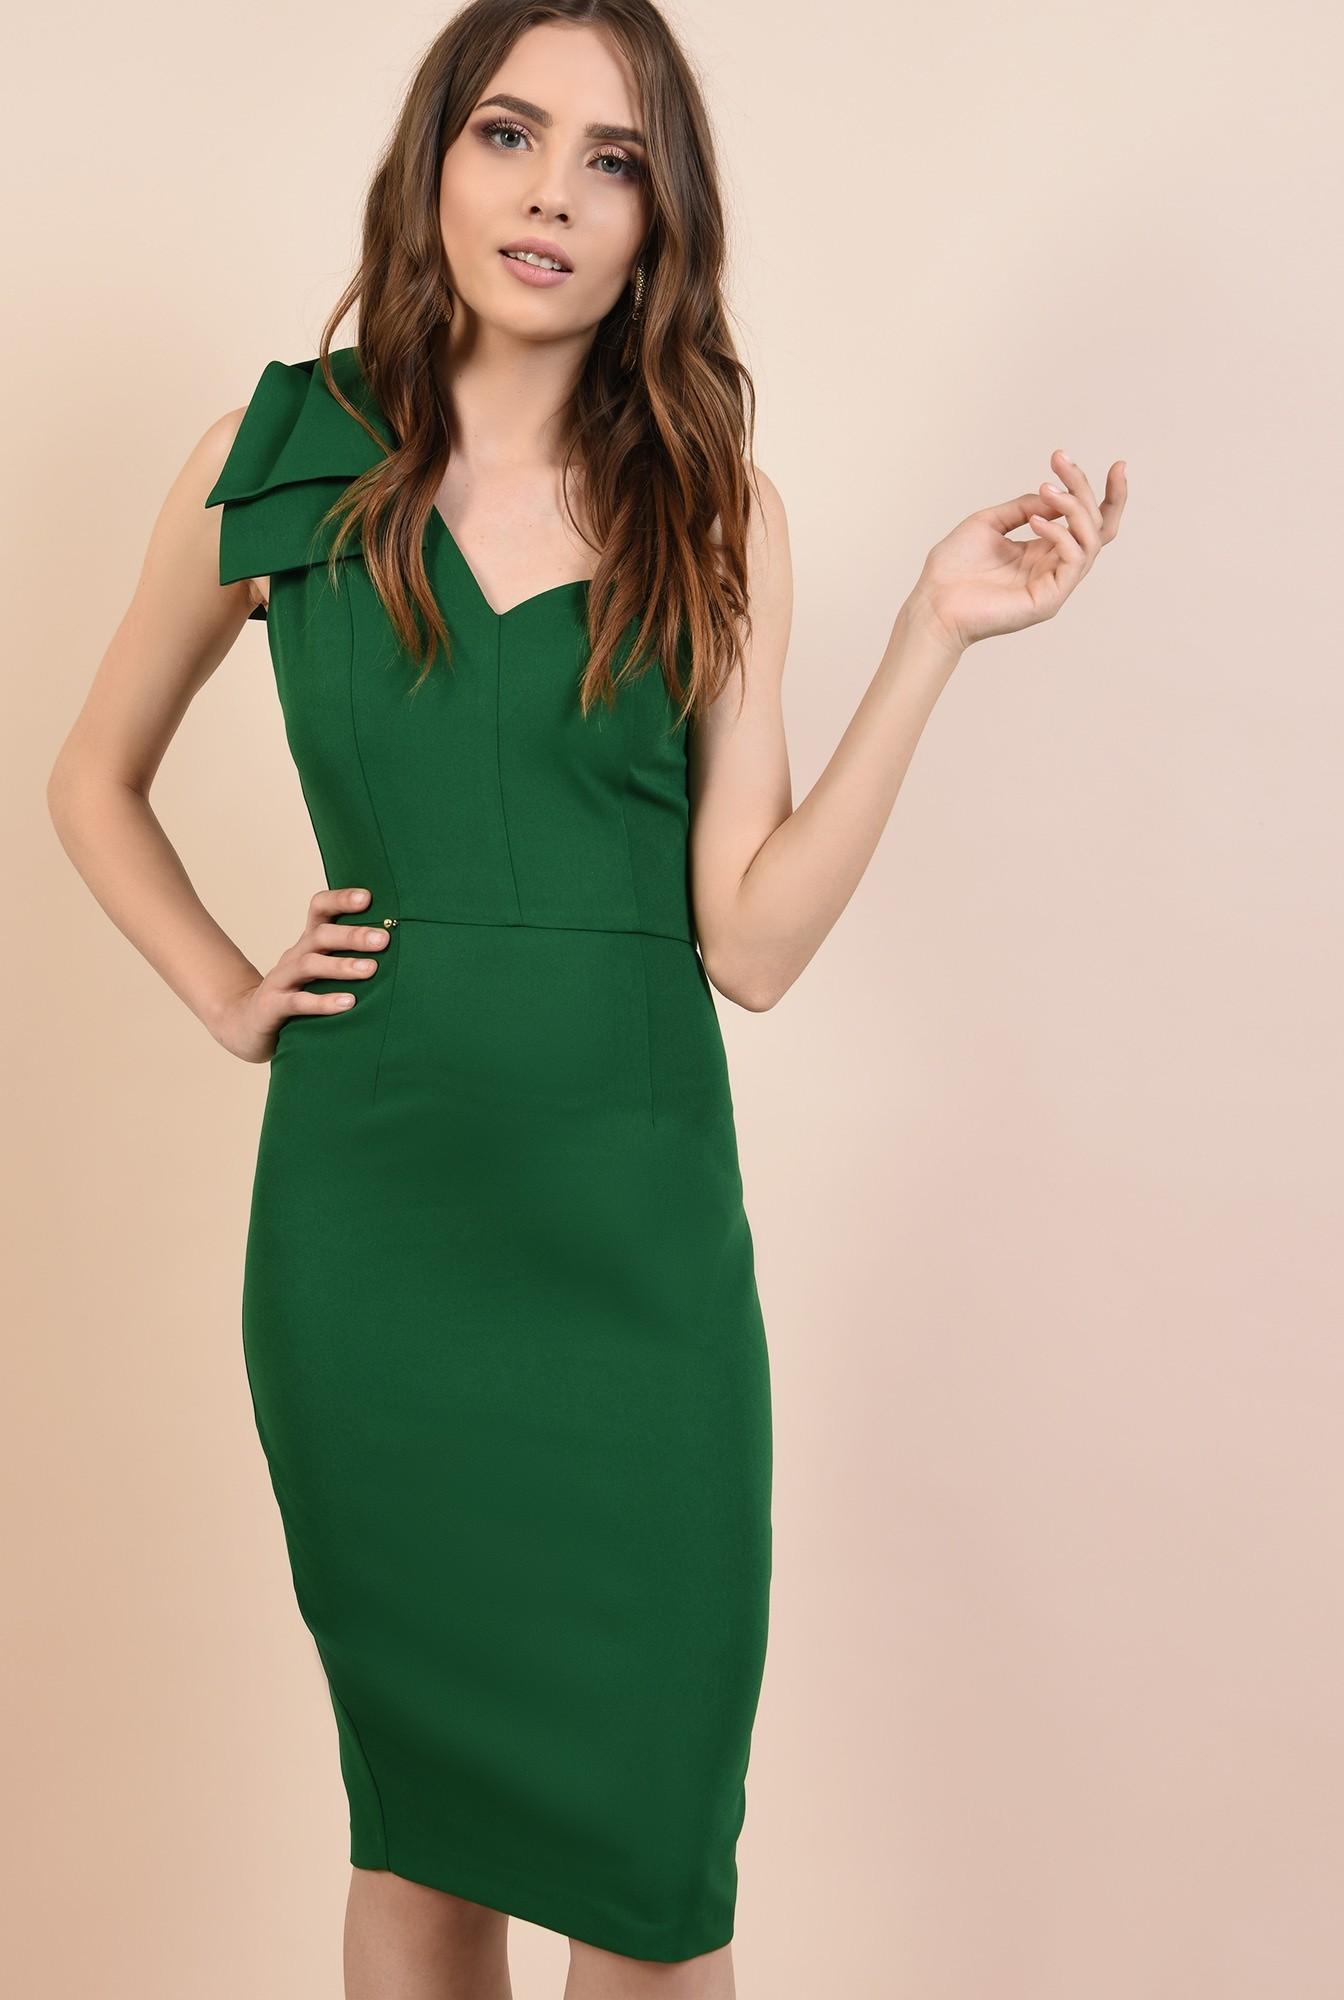 0 - rochie de ocazie, verde, clepsidra, funde la umar, rochii elegante online